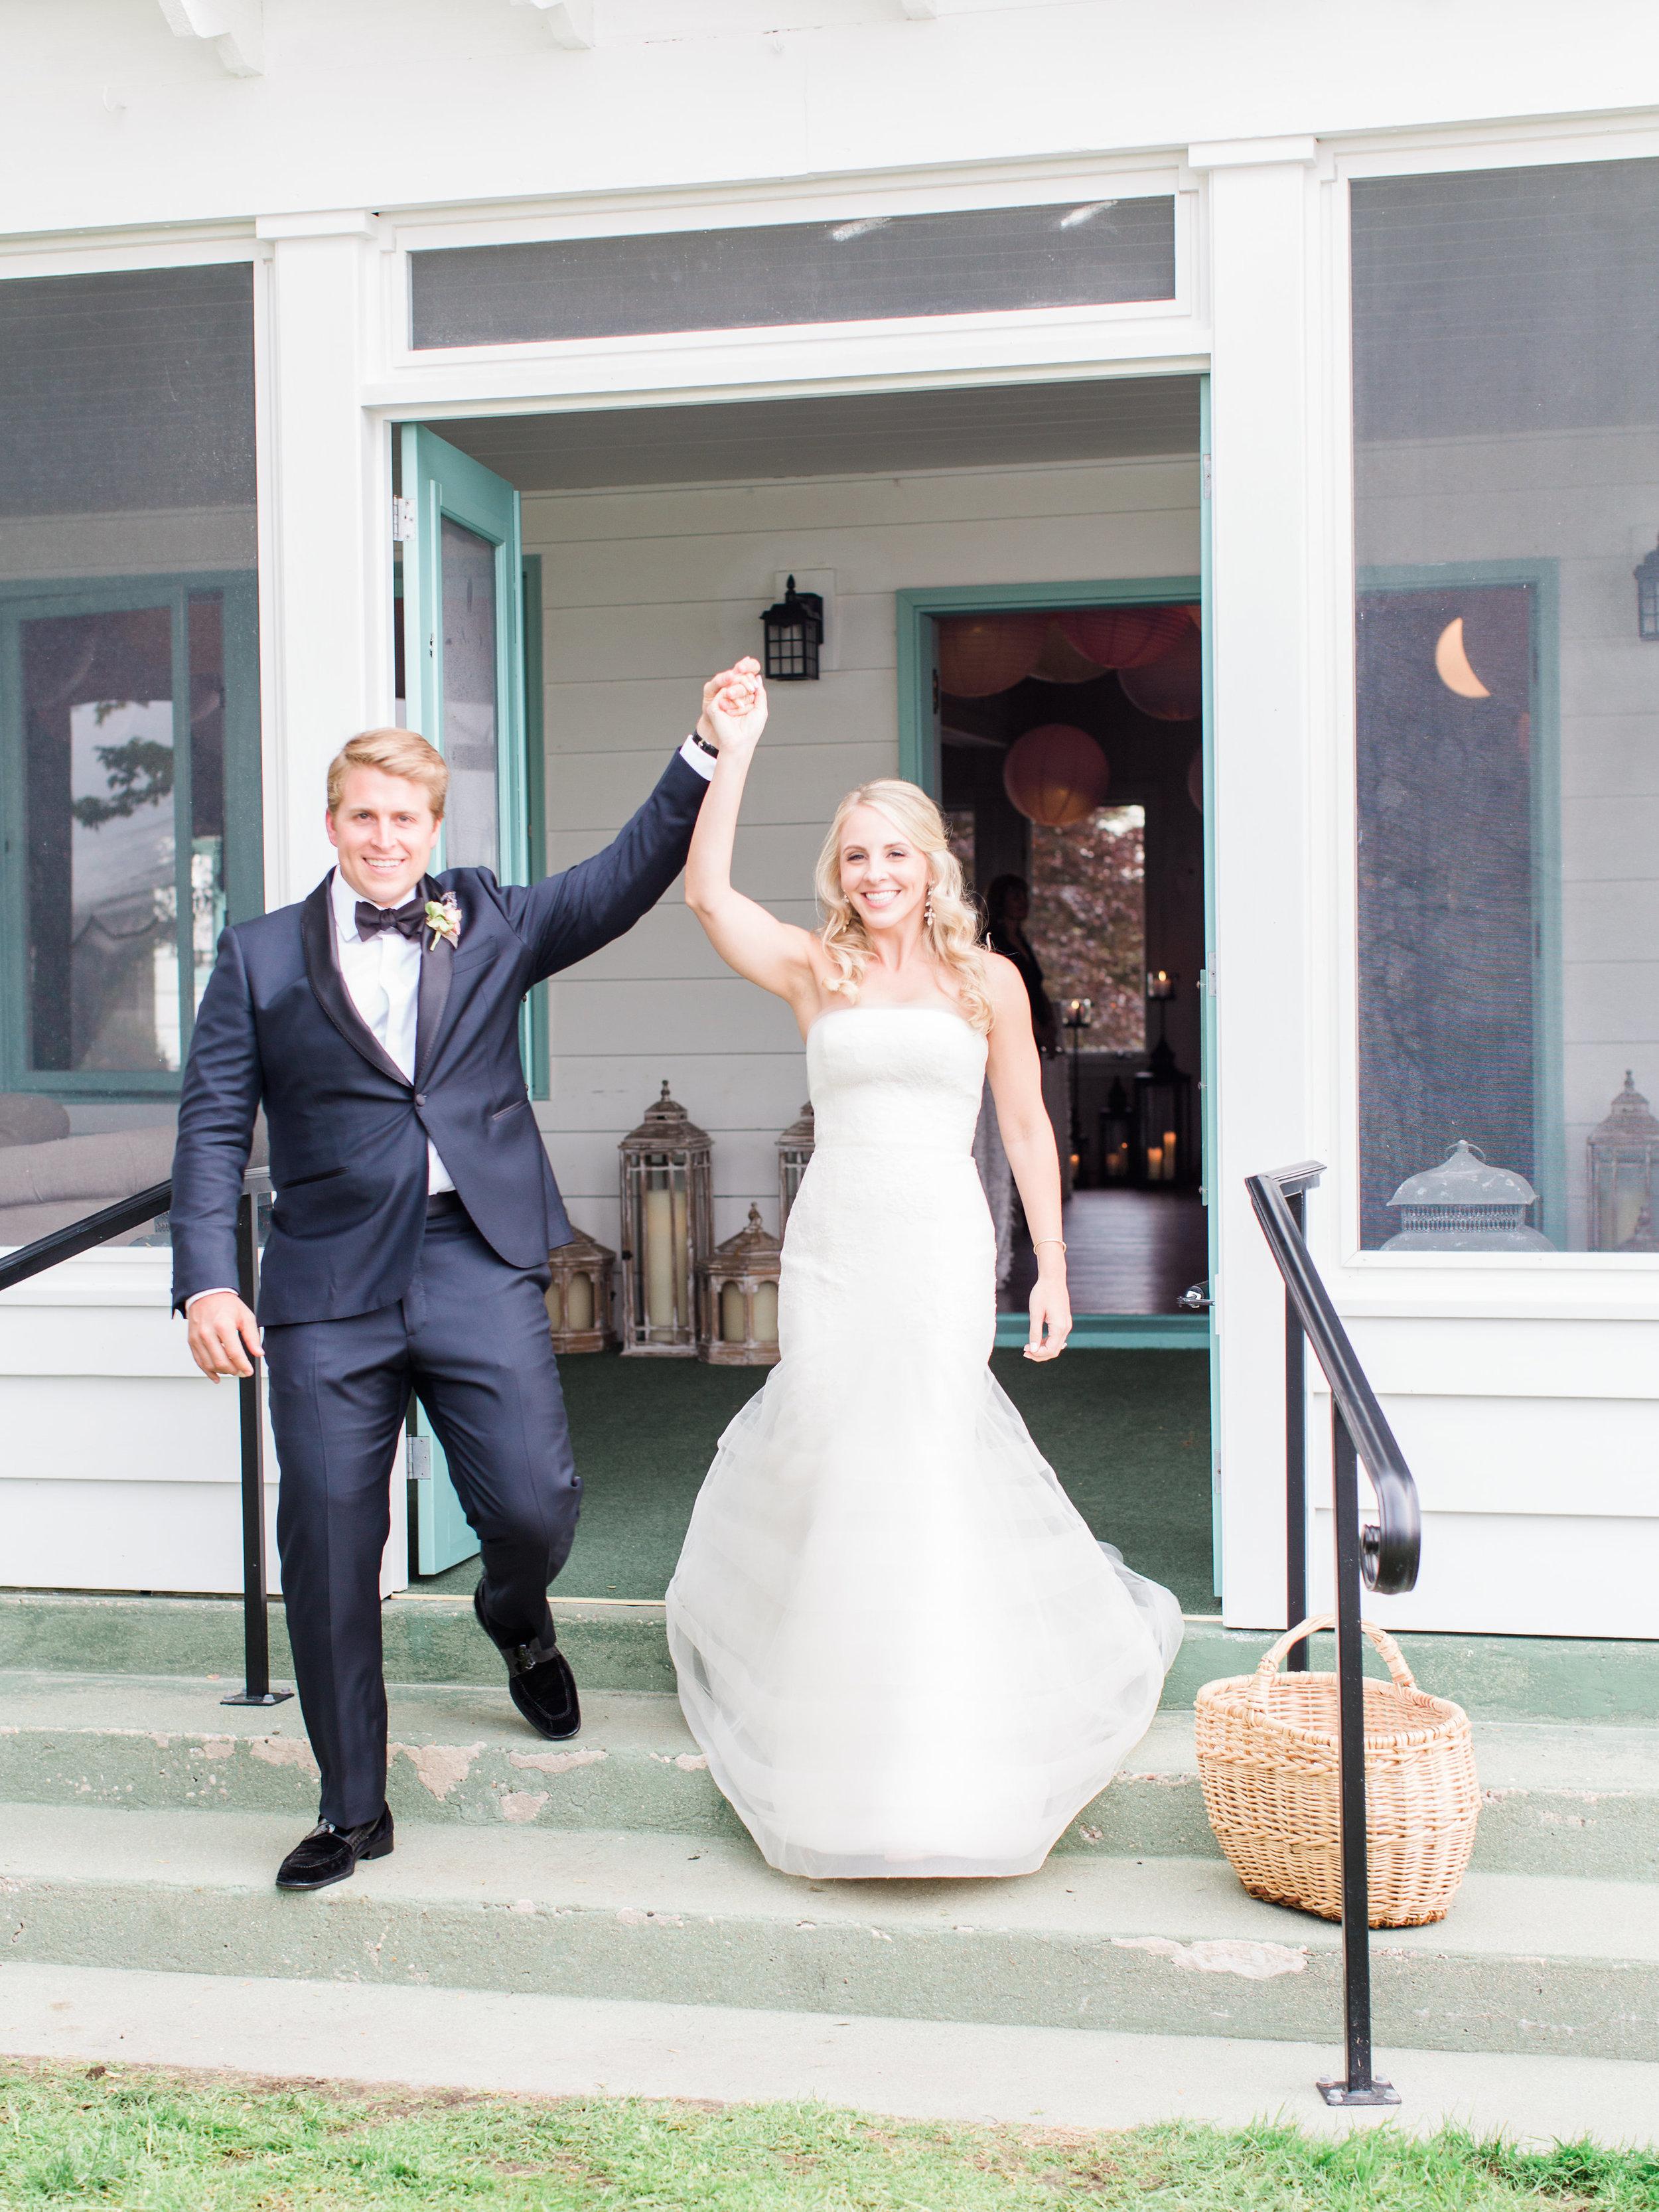 Coffman+Wedding+Reception-4.jpg